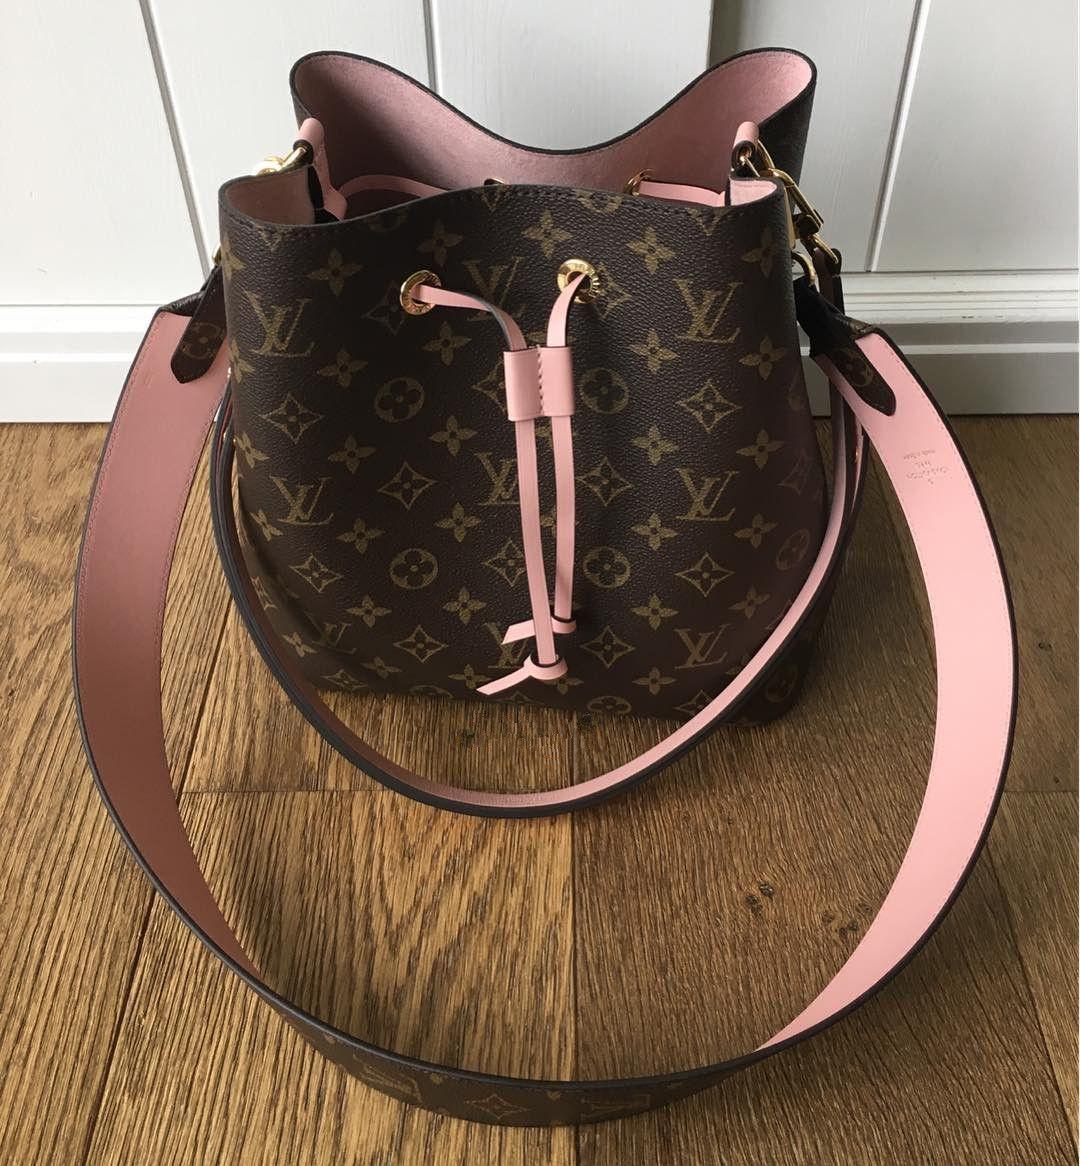 953520a55818  Louis  Vuitton  Monogram Neonoe M44020 M44021 M44022. 2017 Newest LV  Spring  Summer Collection.